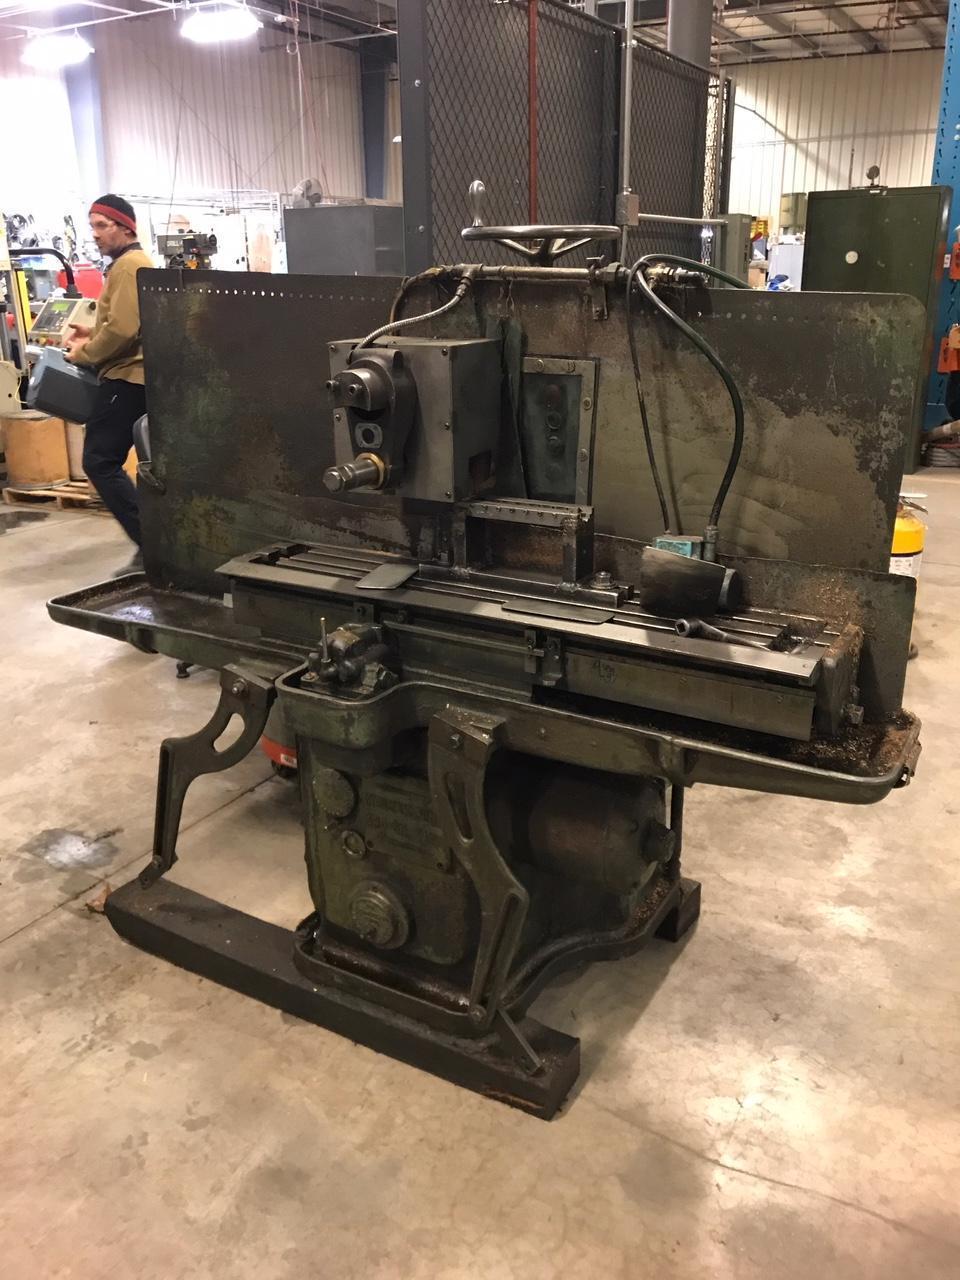 Sundstrand Rigid Mill Model No. 0 Horizontal Milling Machine